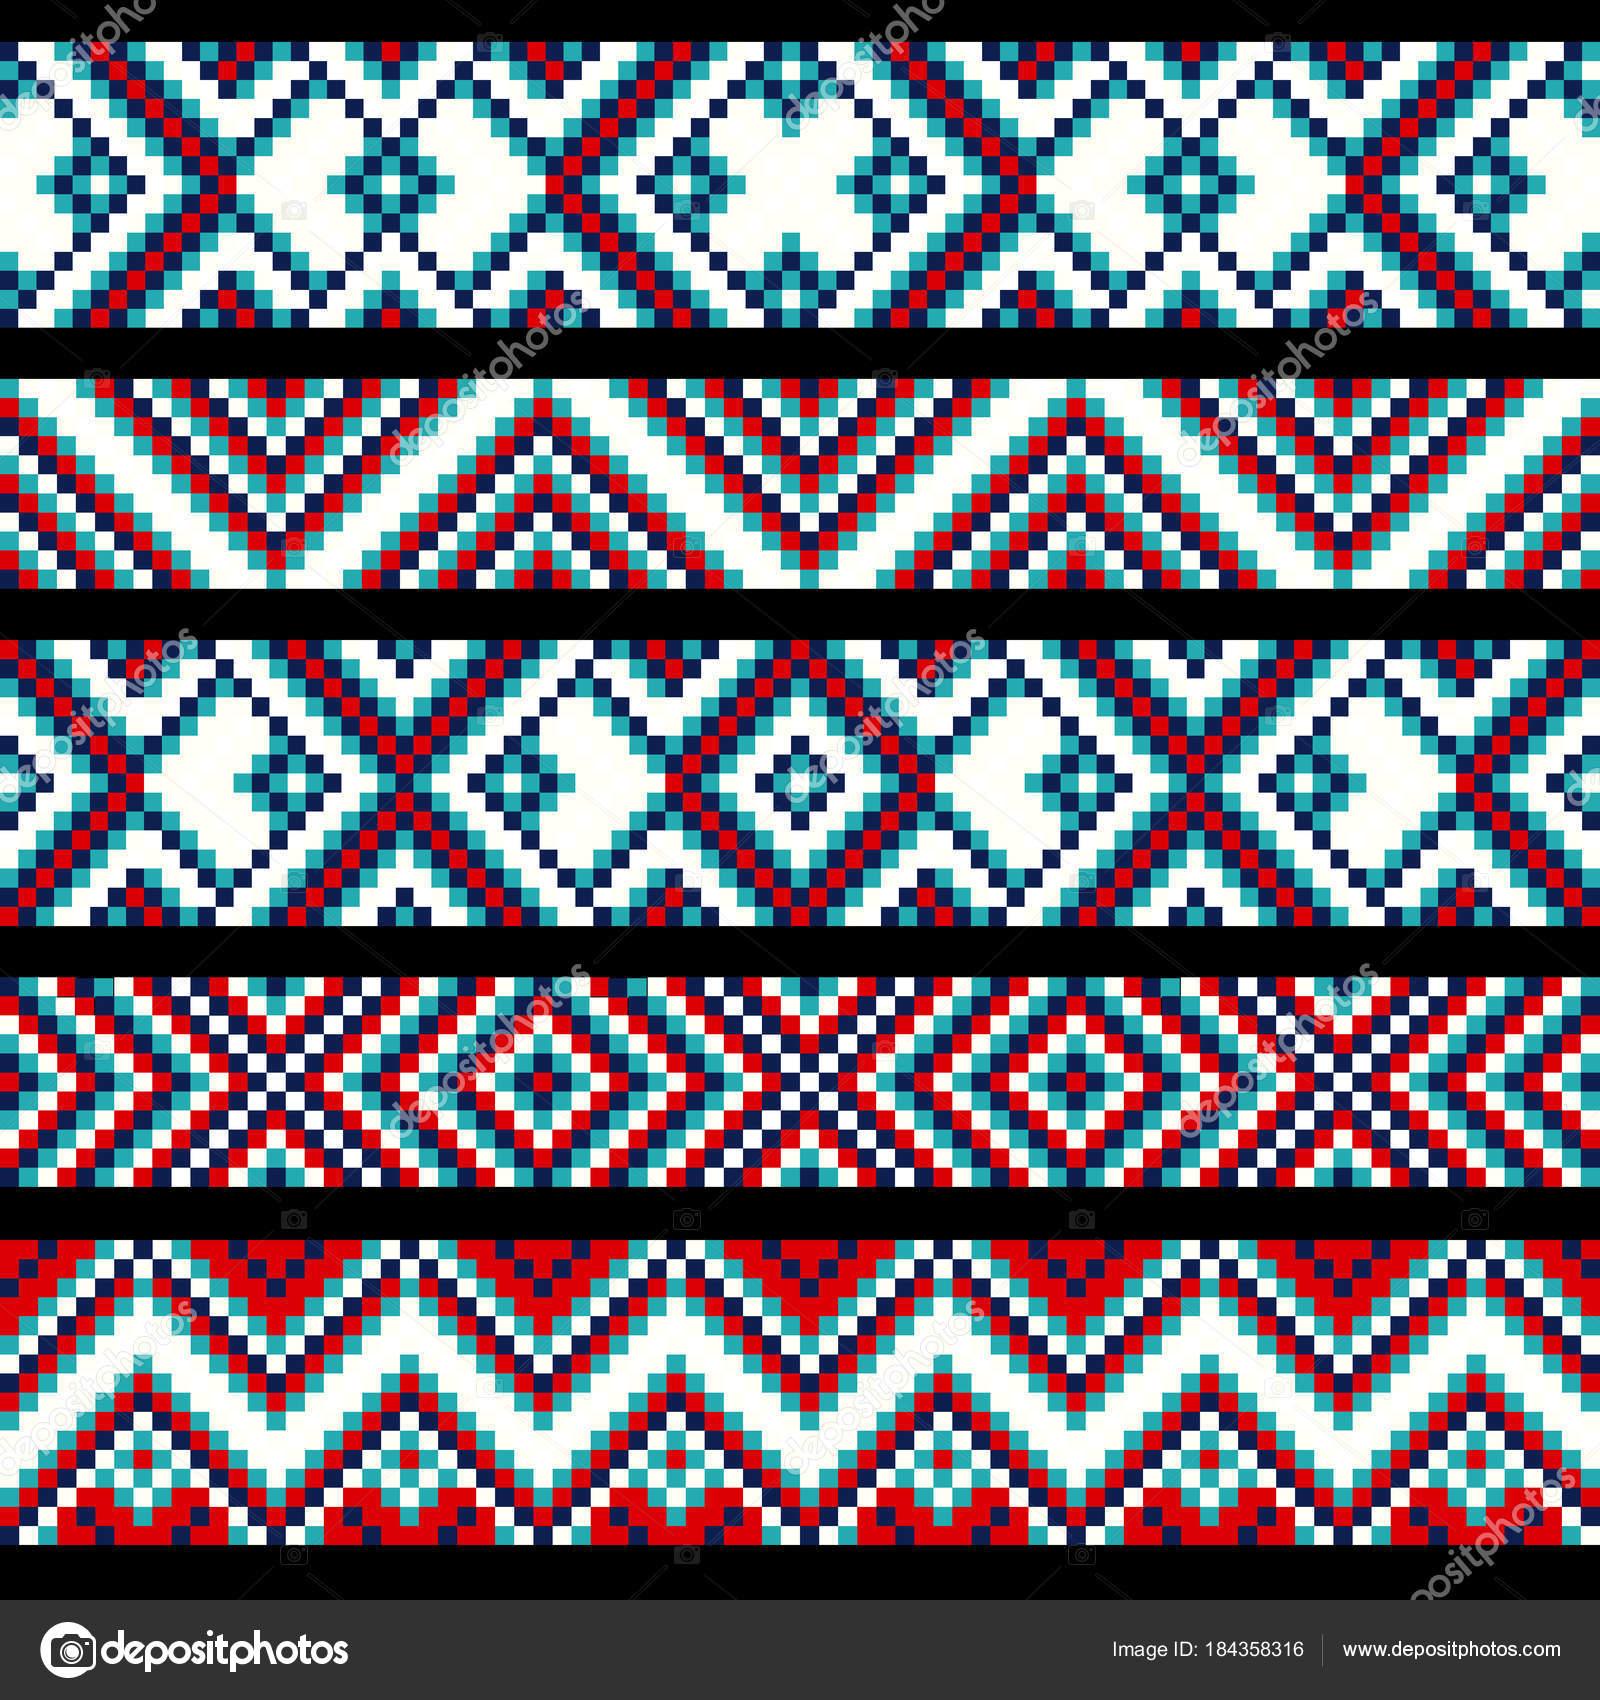 perlen design tribal design stammes perlen perlenkette afrikanische perlen ethnische musterdesign stickerei kreuz quadrate diamanten - Perlen Weben Muster